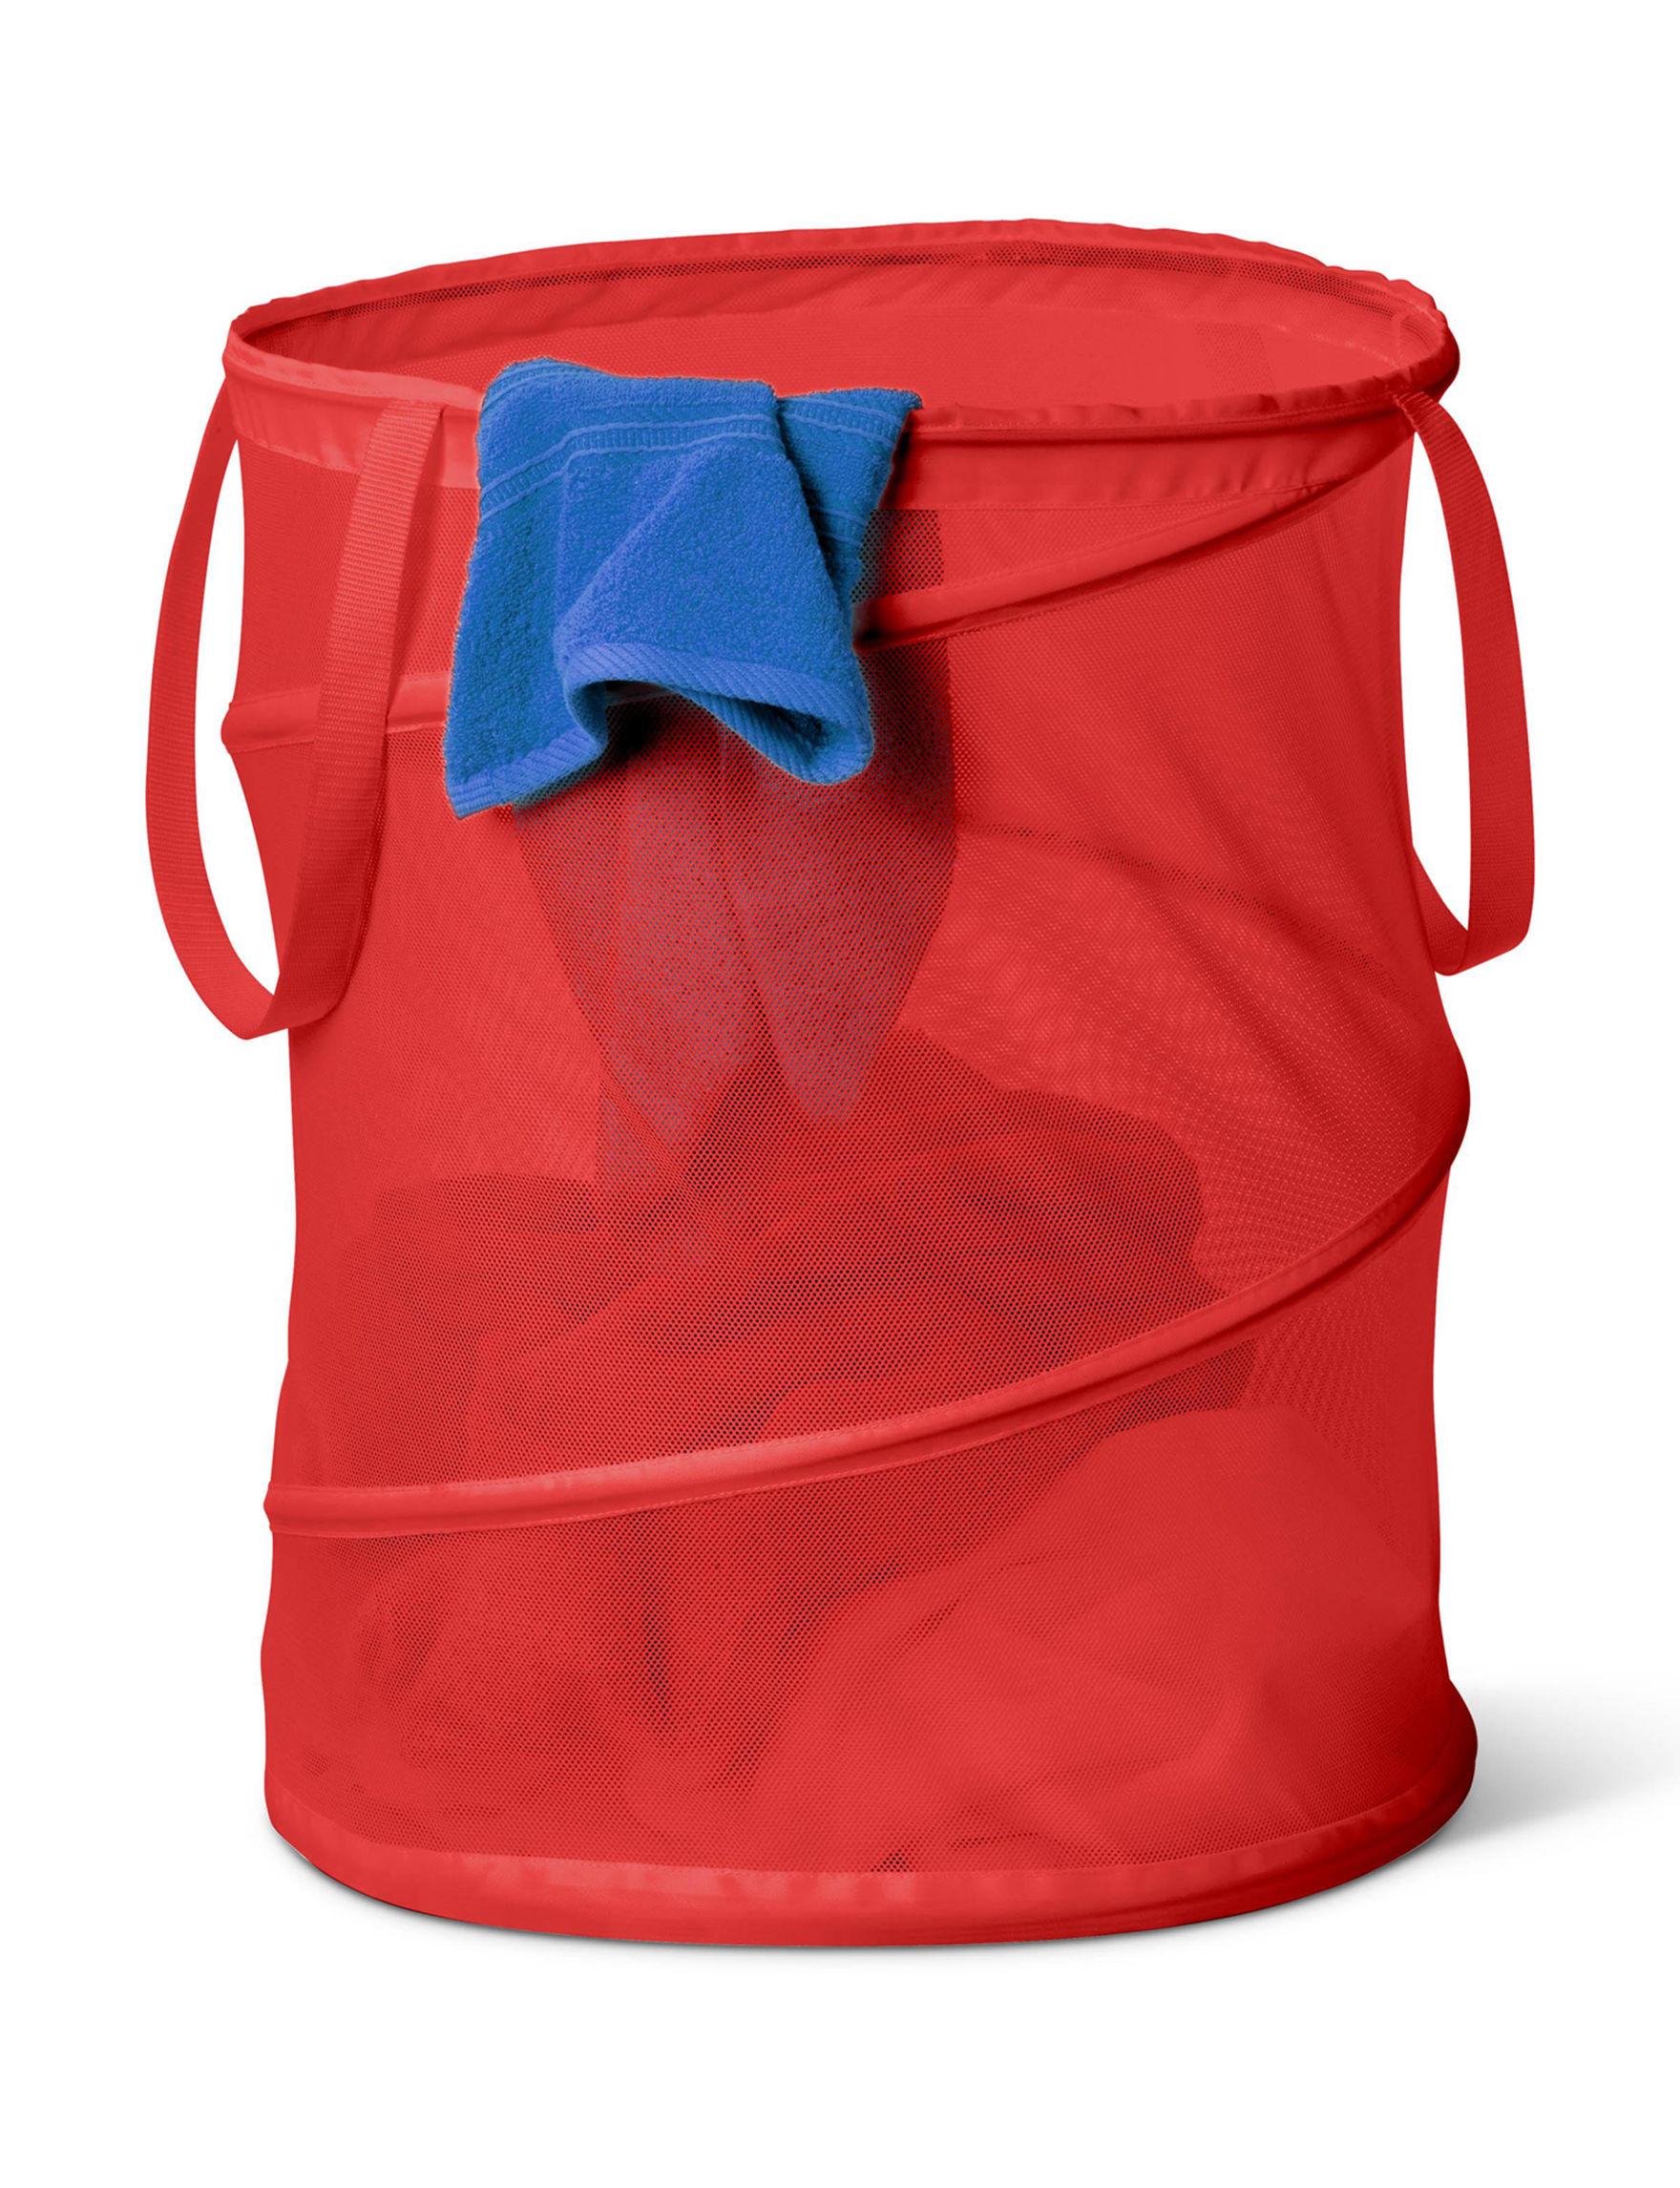 Honey-Can-Do International Red Laundry Hampers Storage & Organization